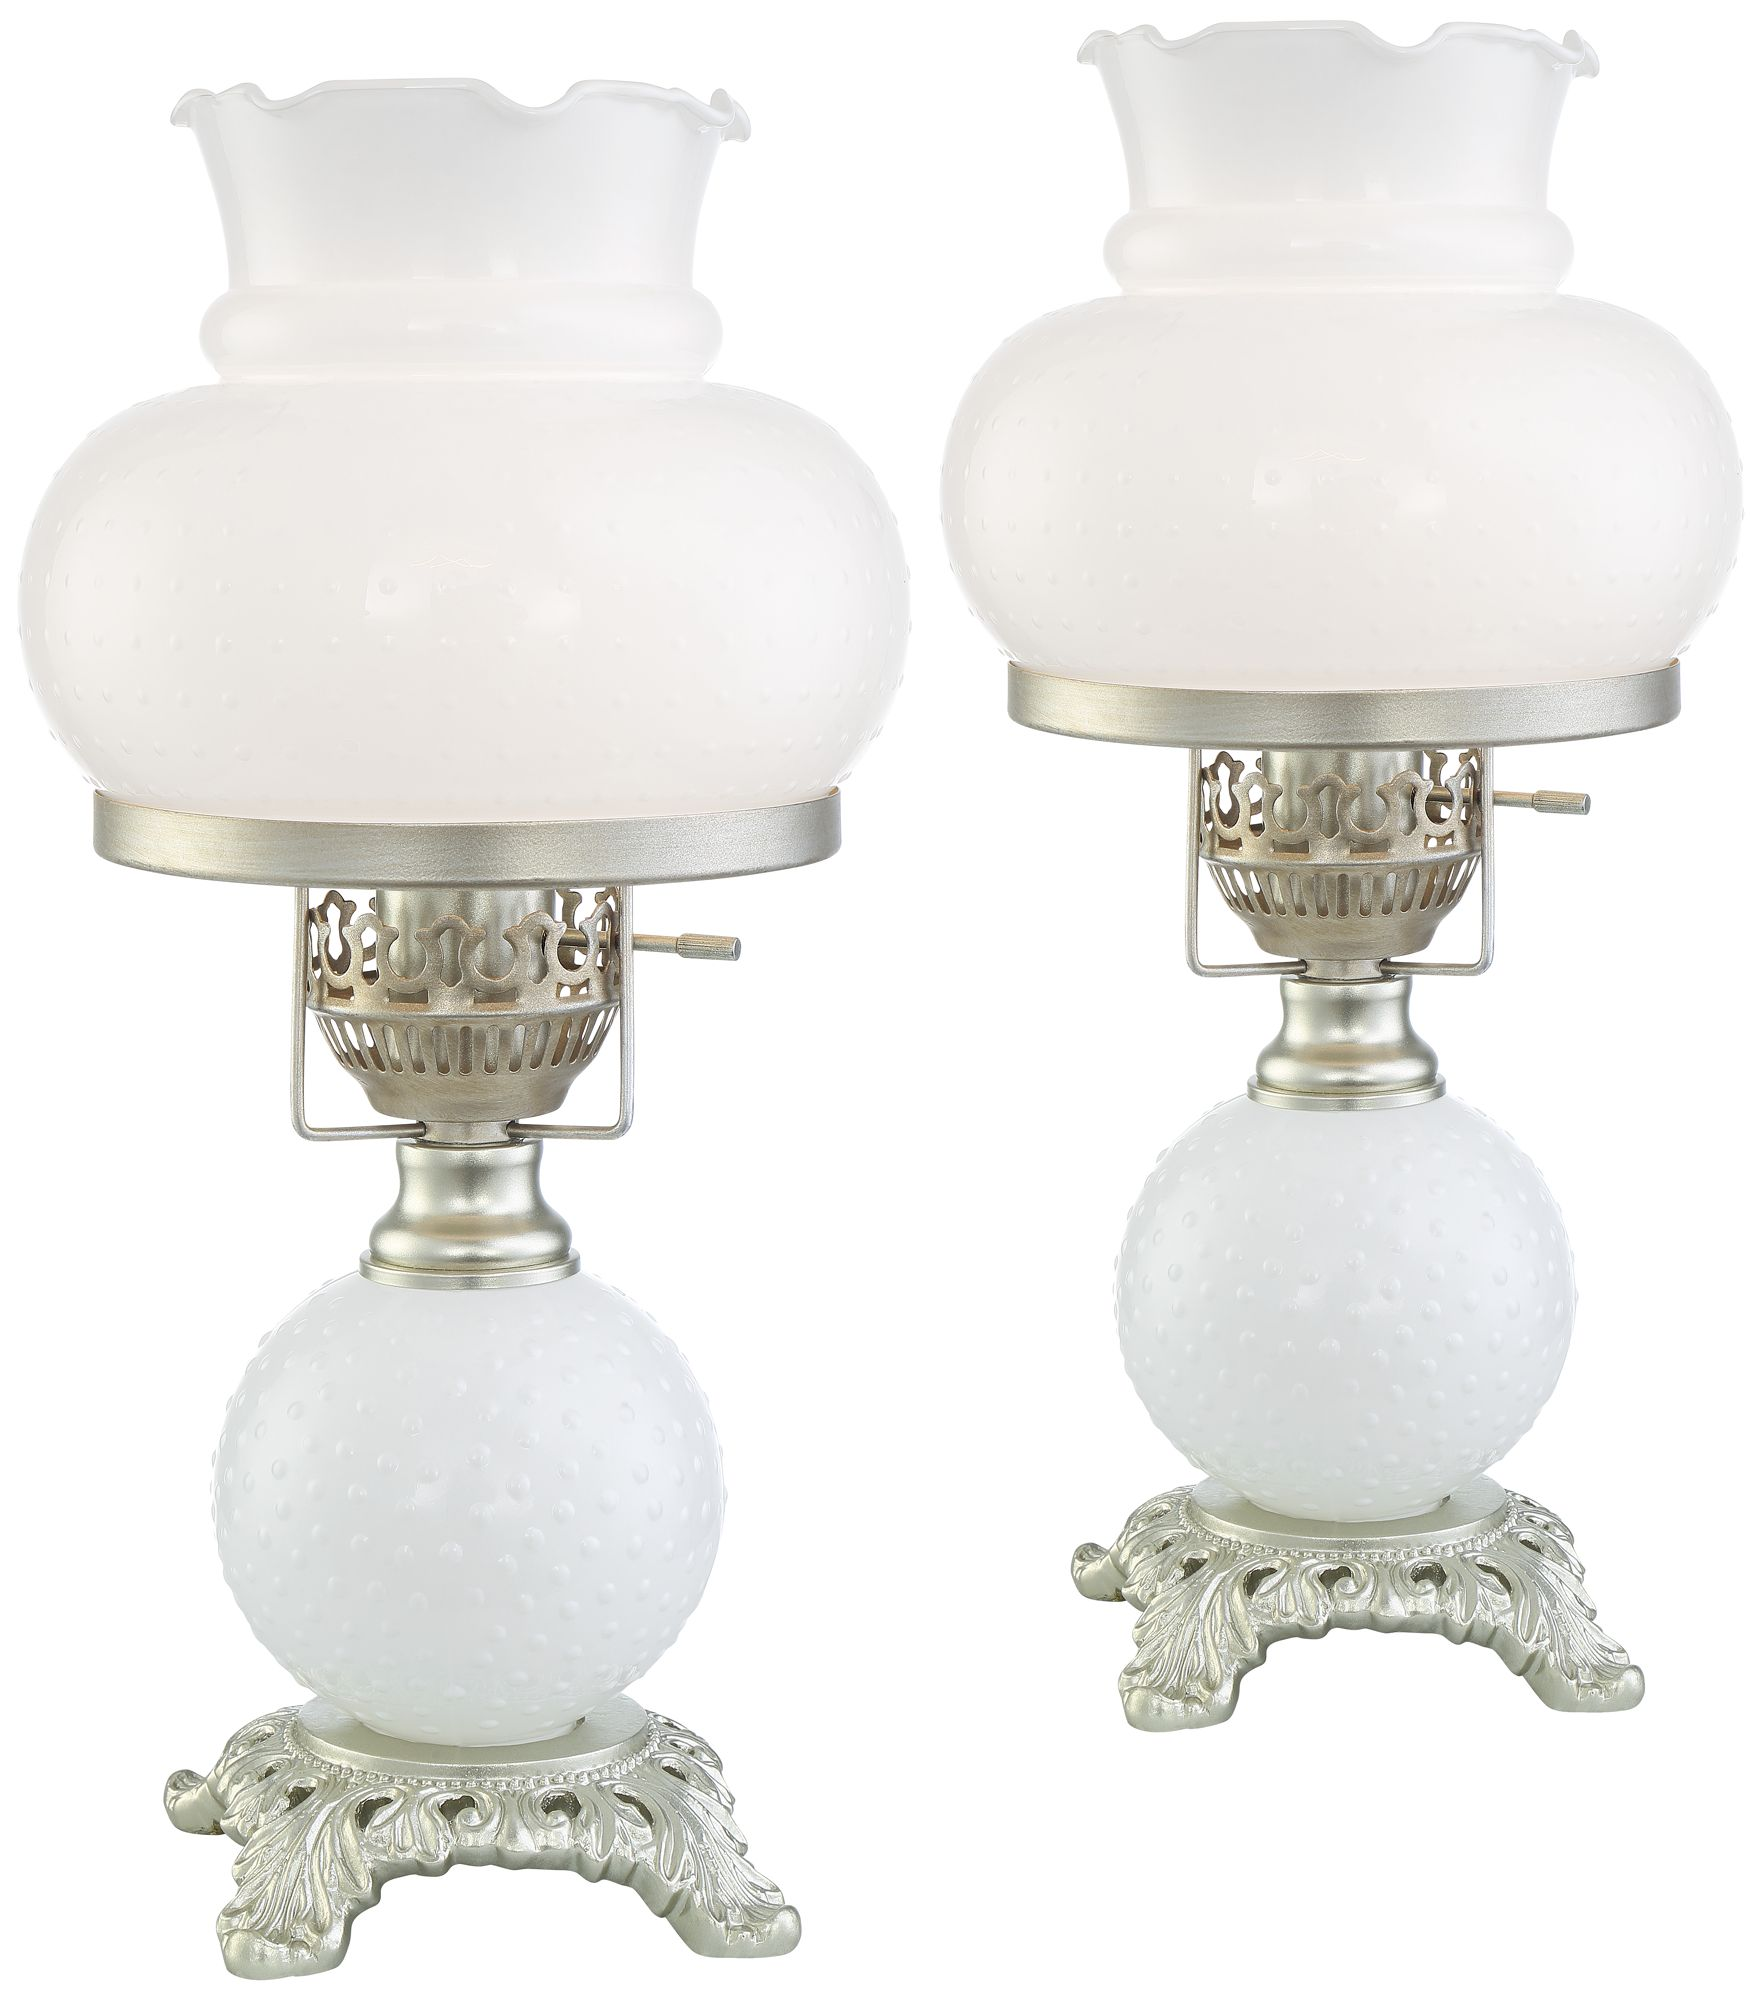 billy 16 high white milk glass hurricane lamps set of 2